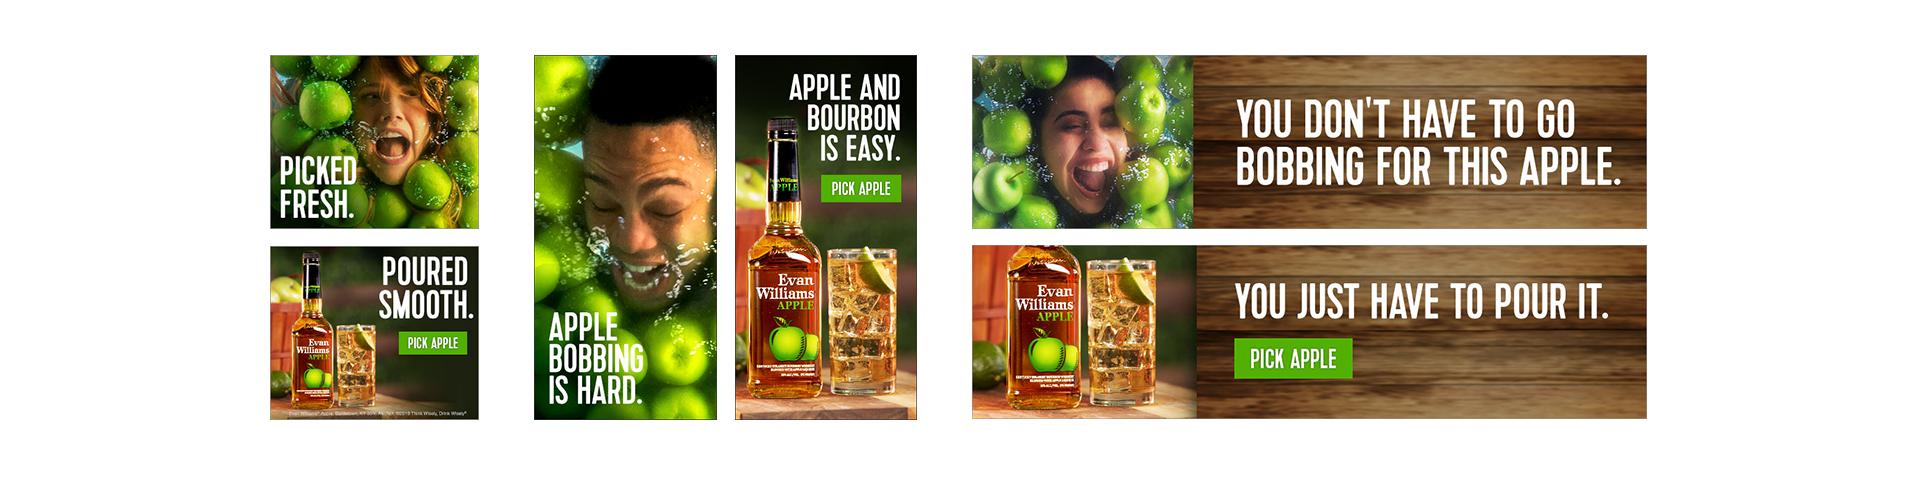 ew-apple_banner_2